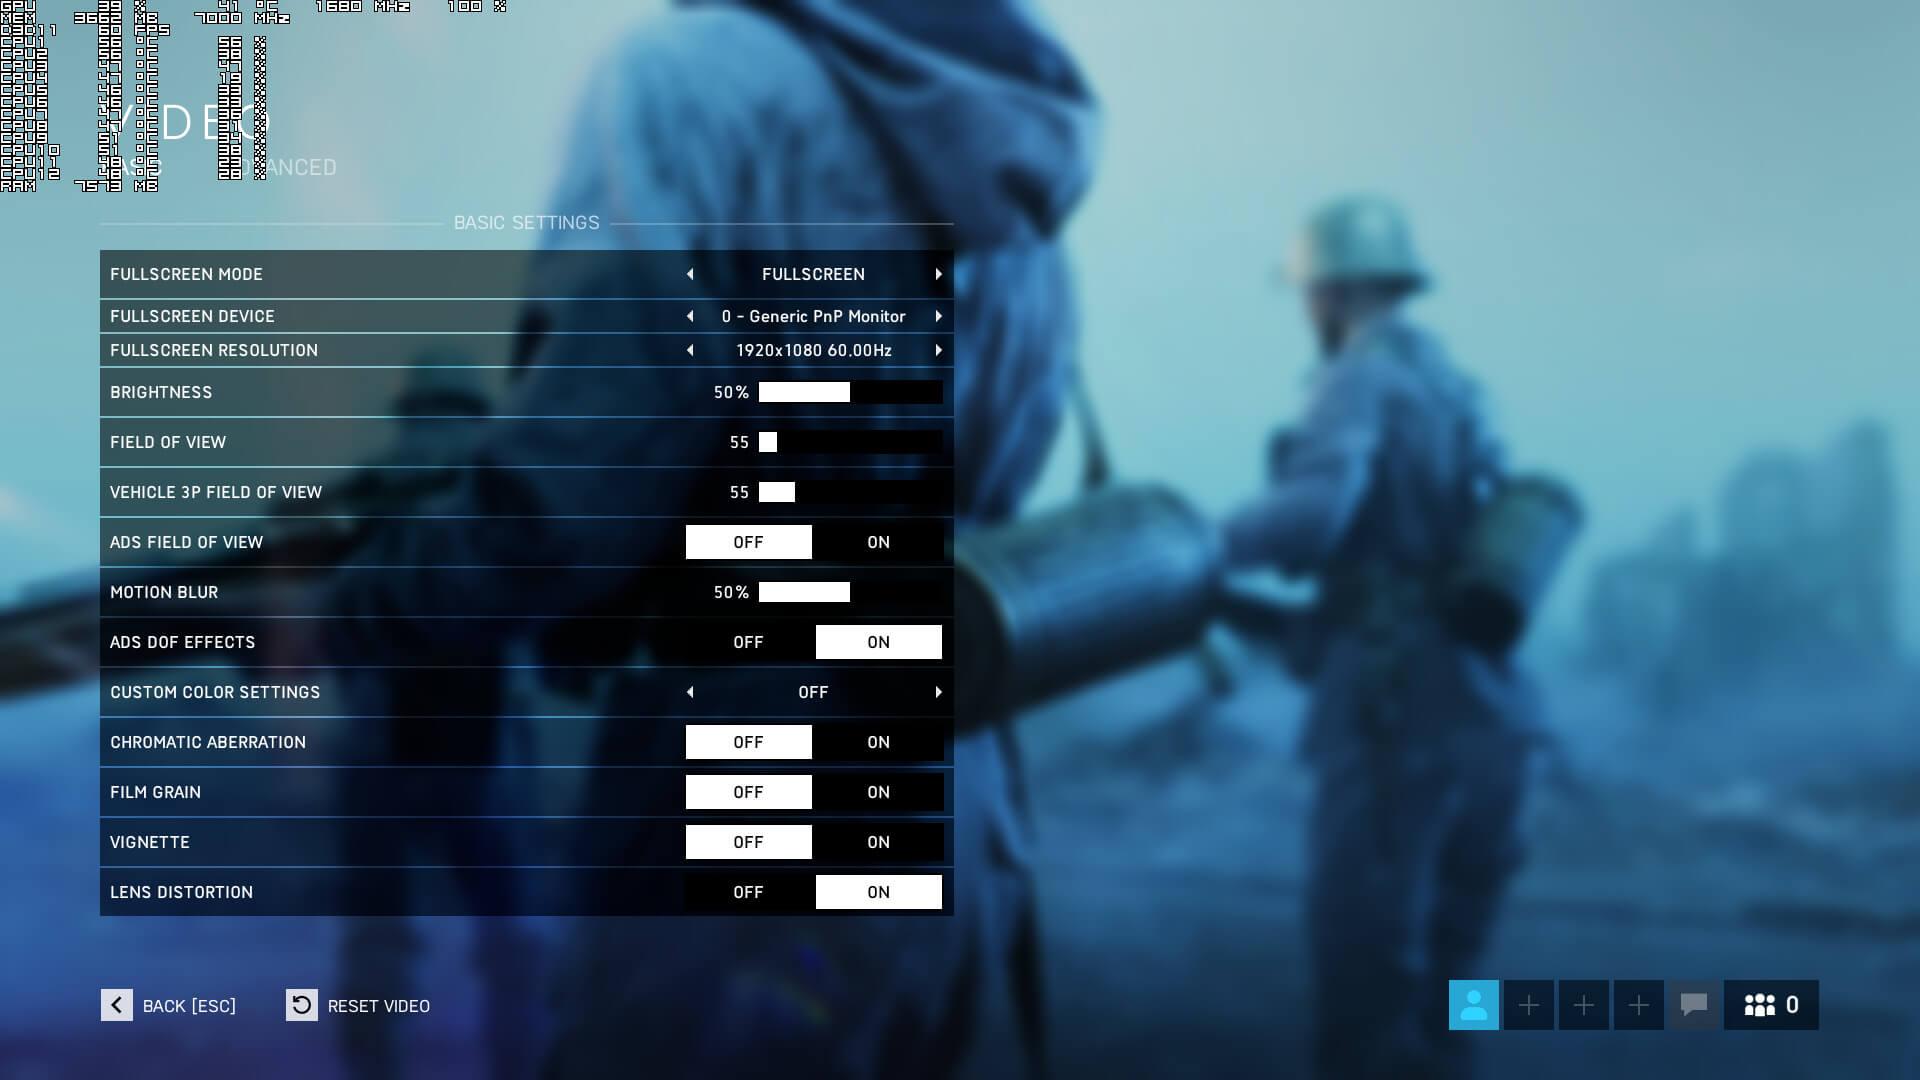 Battlefield 5 PC Performance Analysis - DSOGaming